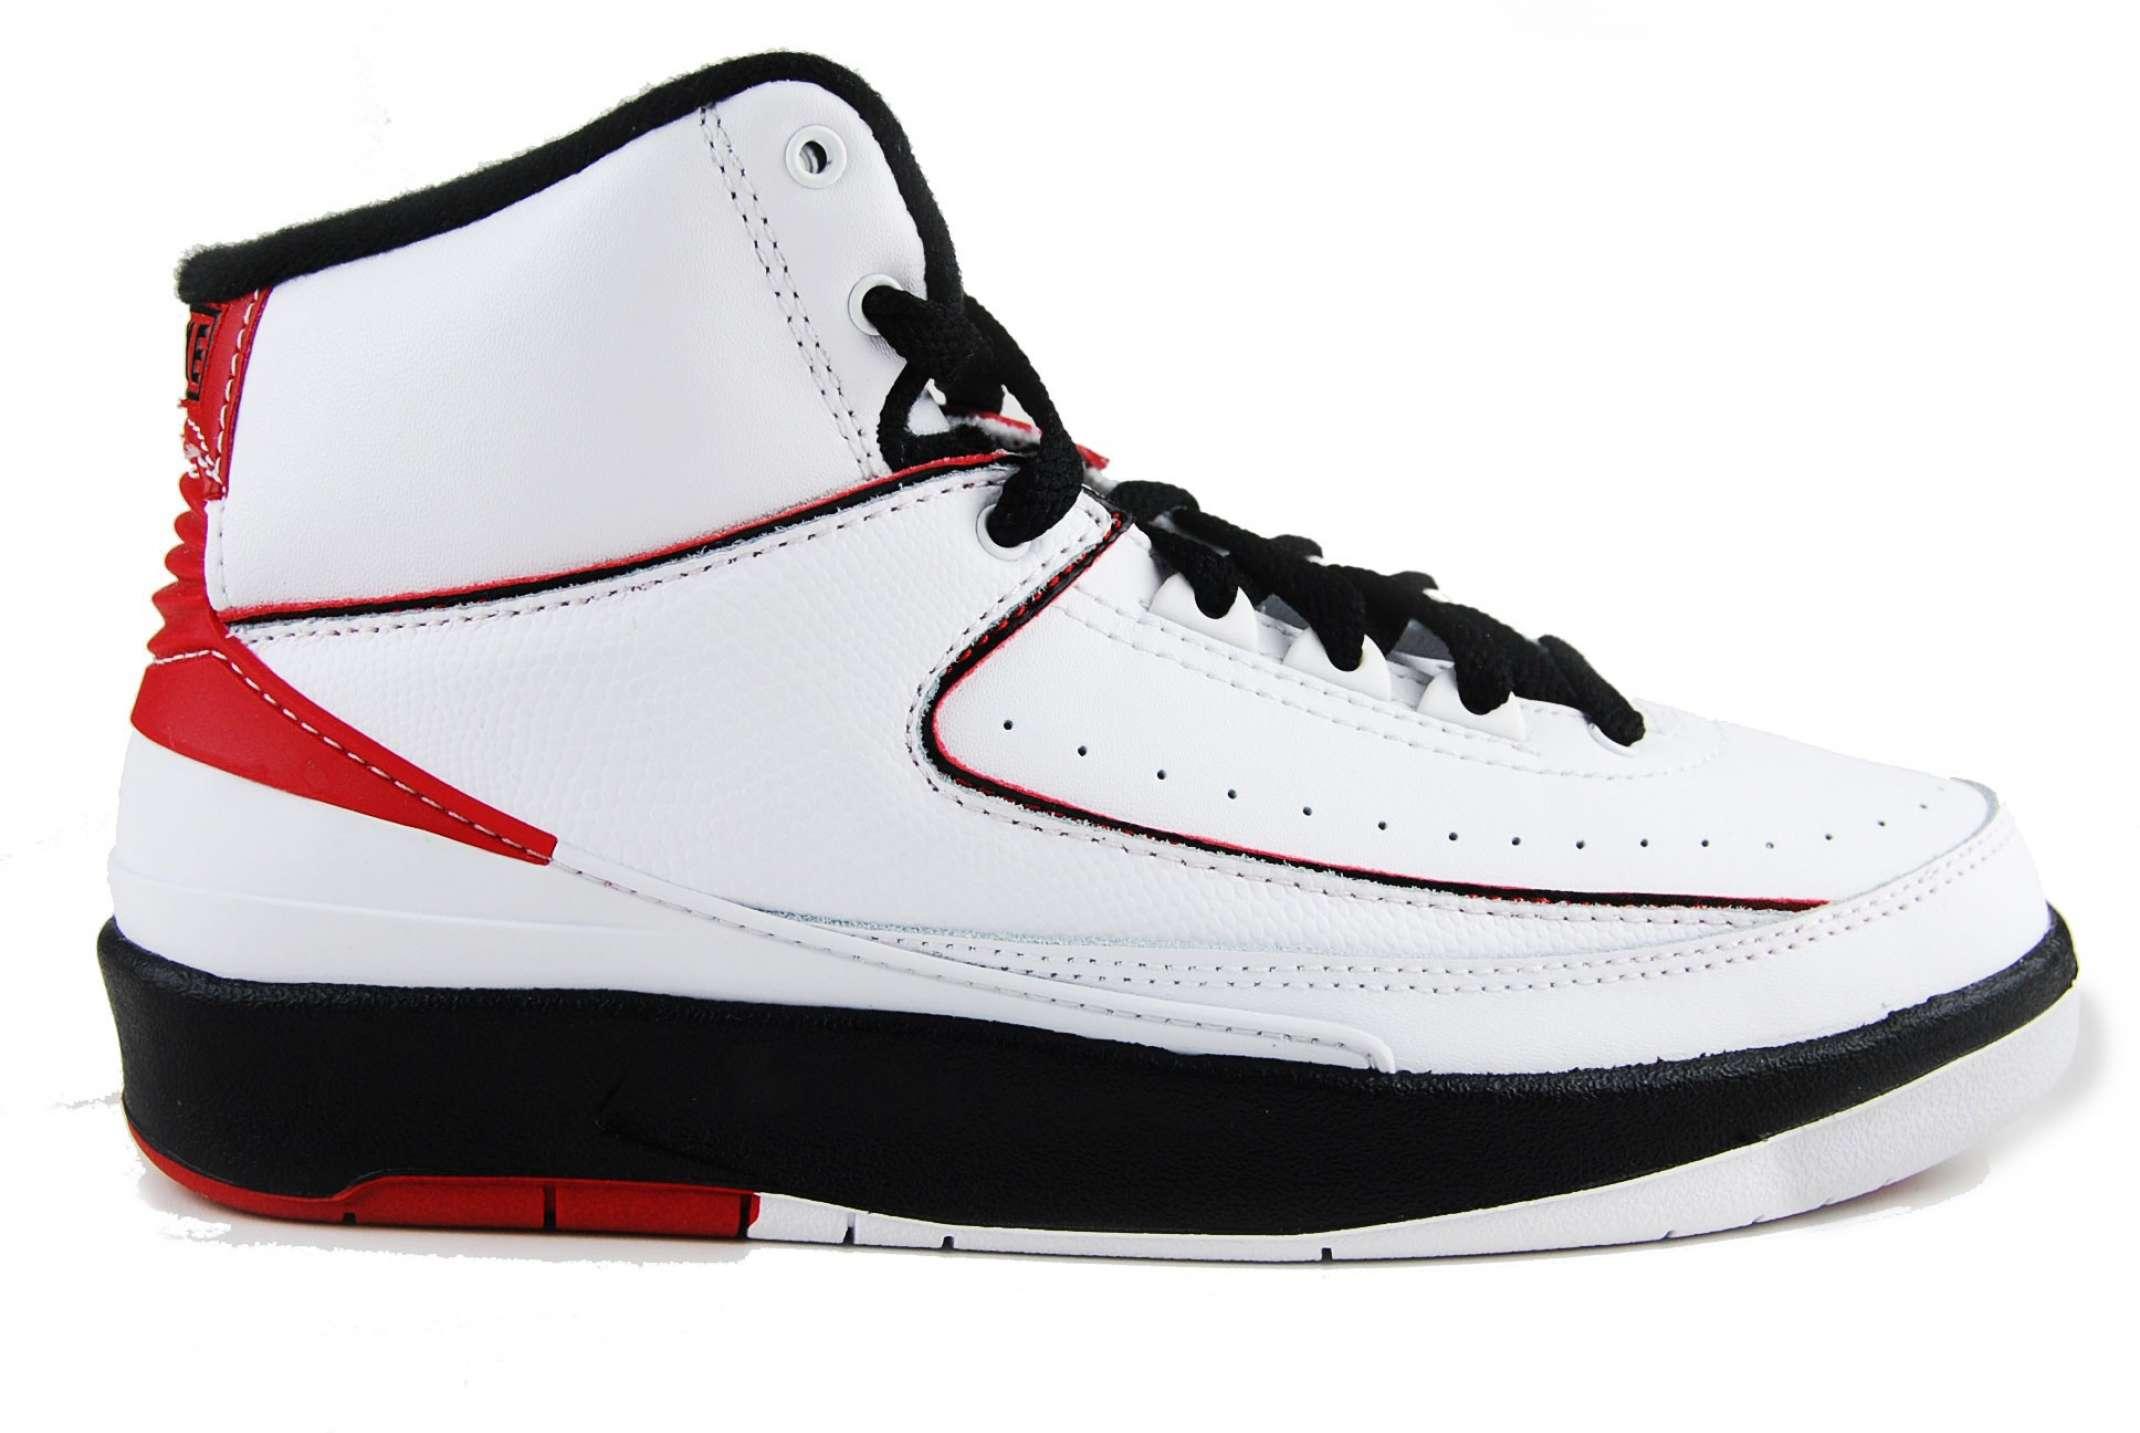 4f4b0b9730092c Seduced by Sneakers again!